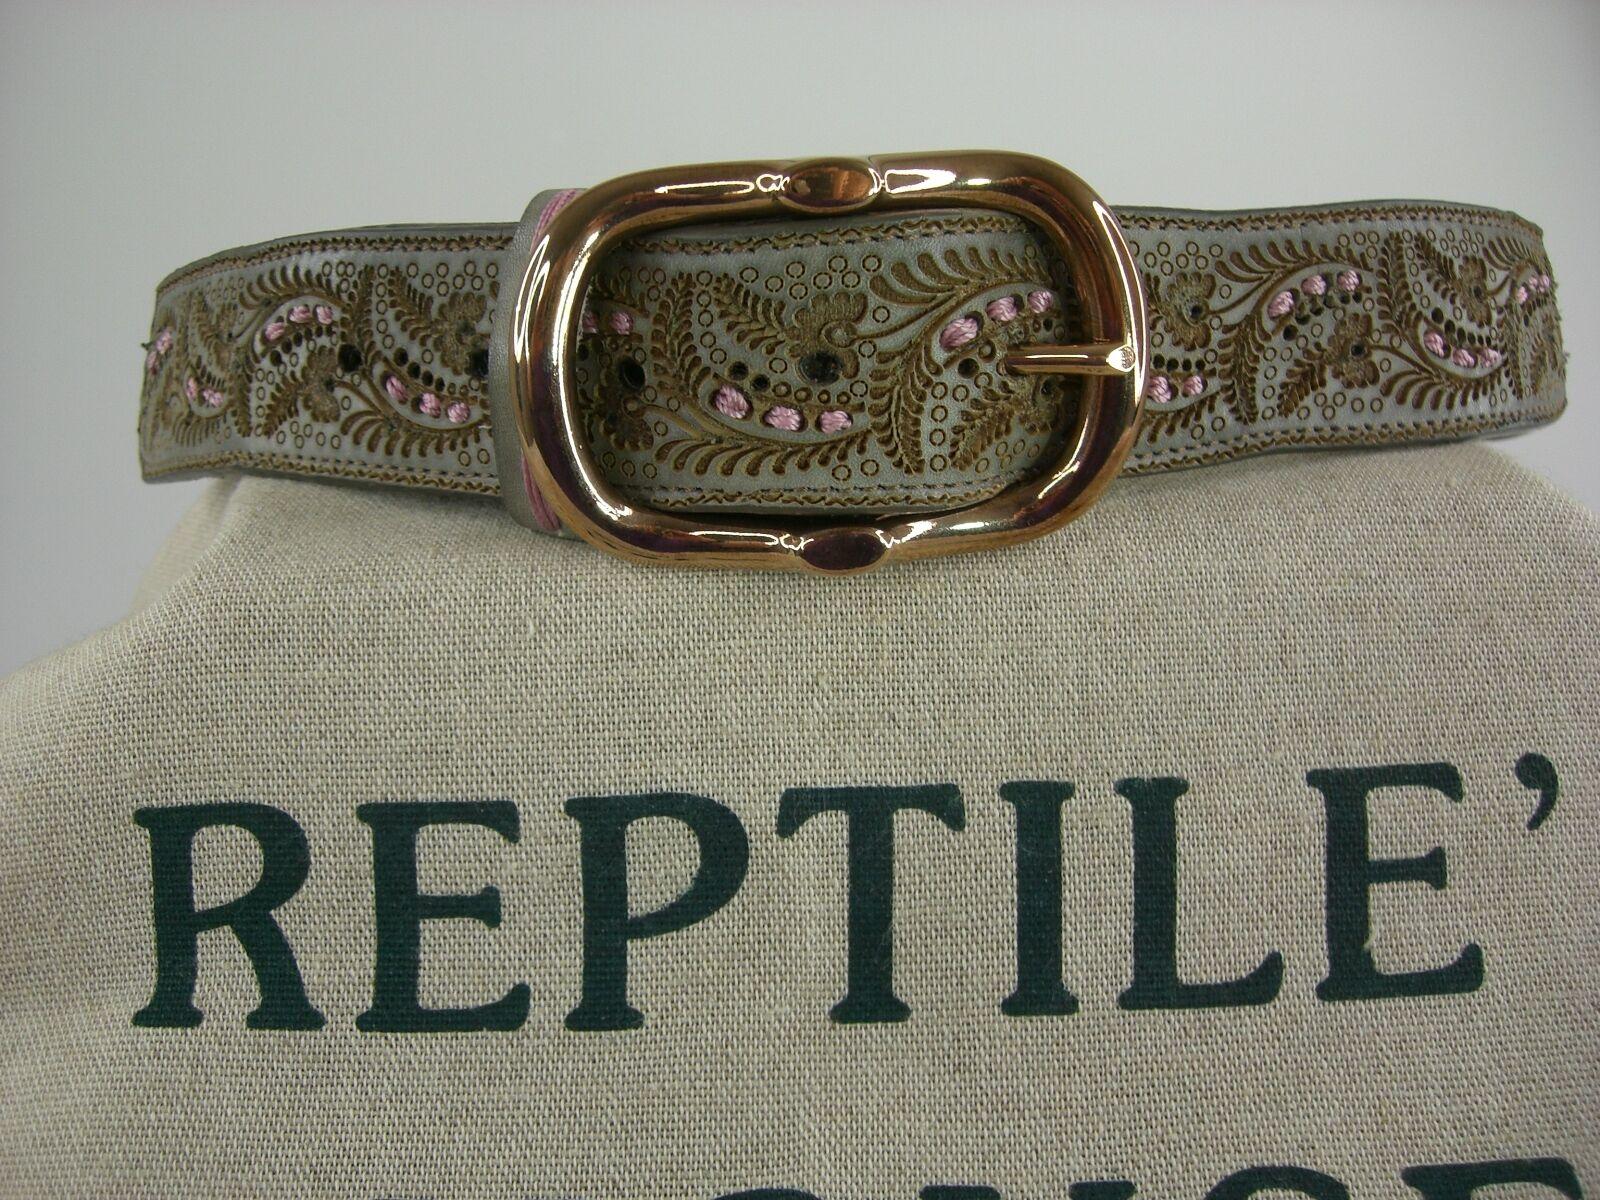 Original Reptile's Reptile's Reptile's HouseGürtelmit Schliesse Sattelleder aufwendige Deco neu    | Discount  dd5263